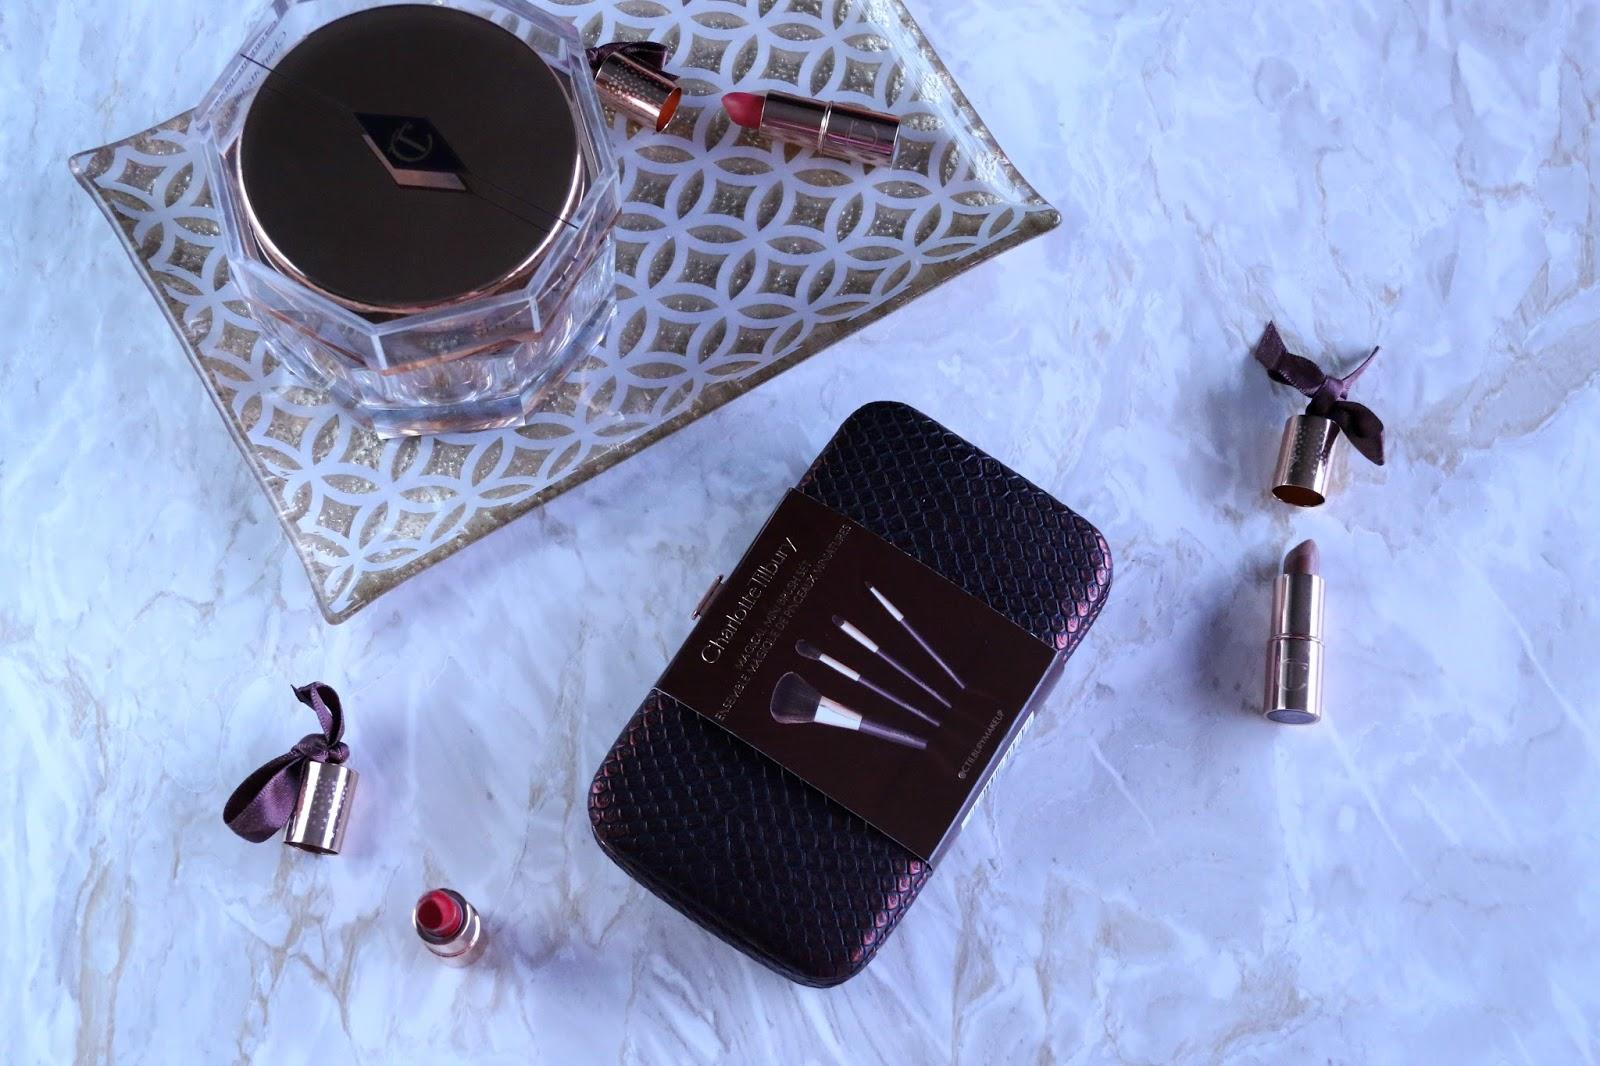 Charlotte Tilbury Magical Mini Makeup Brush Set Review